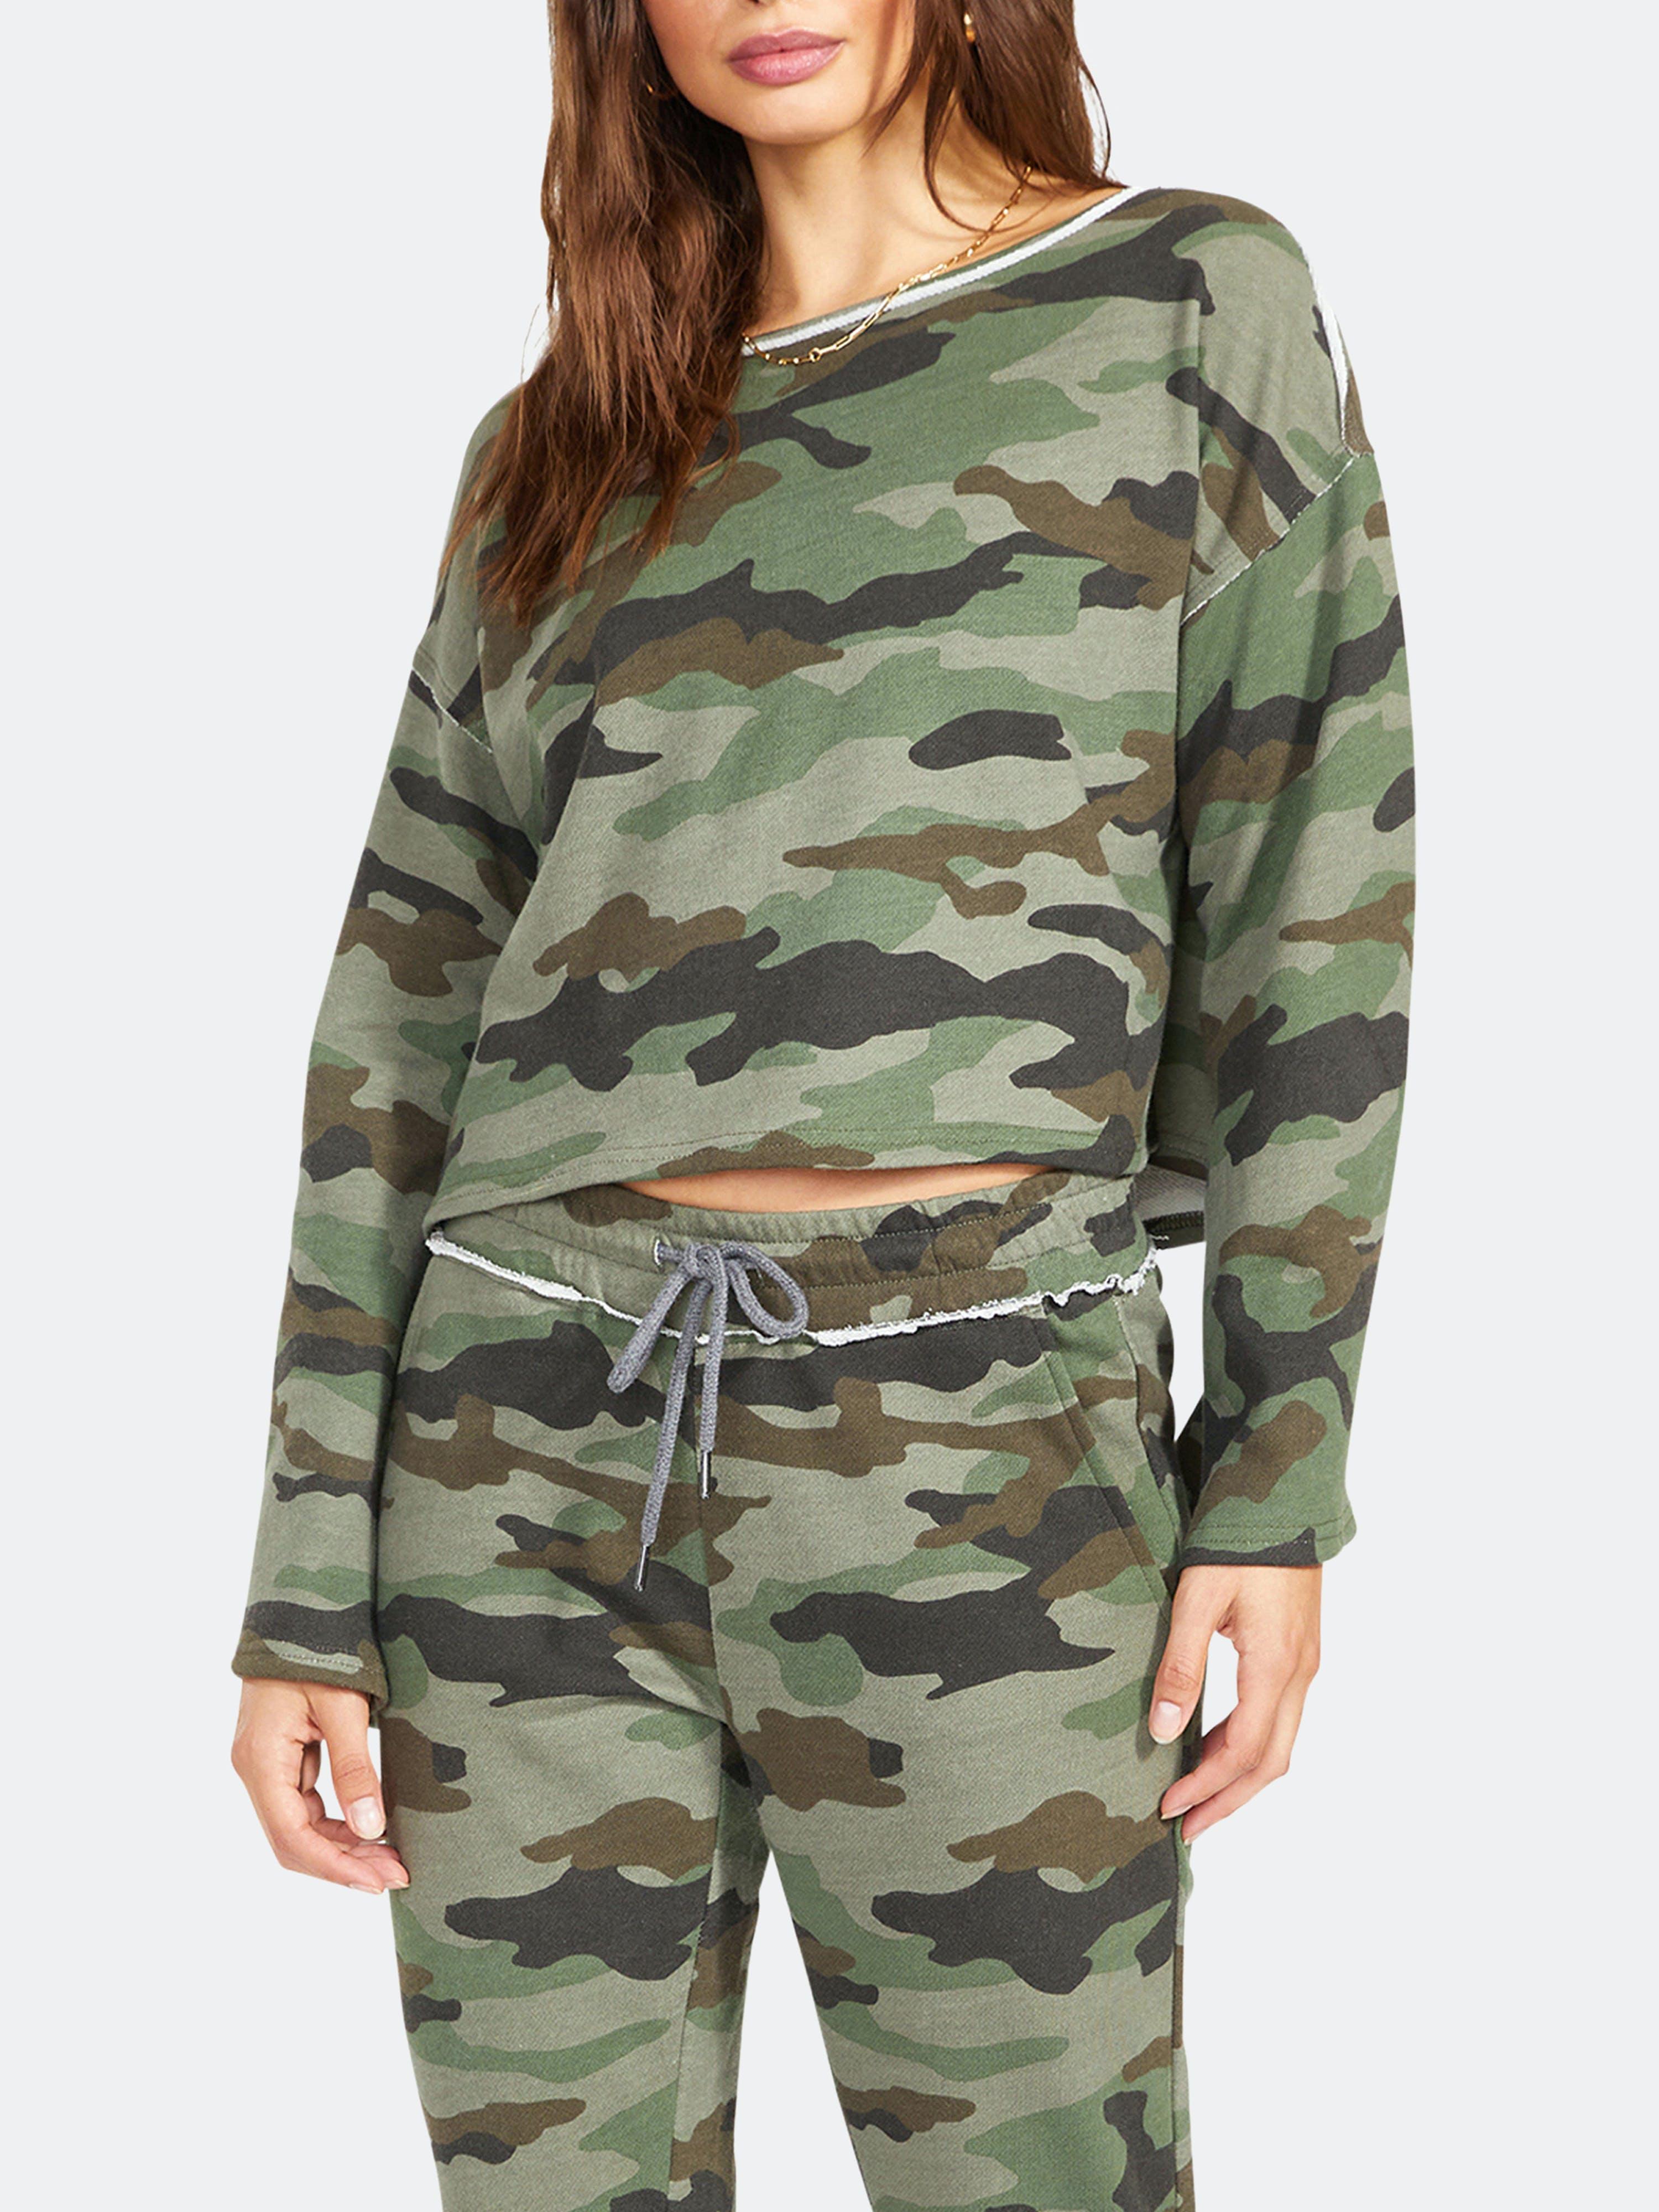 Bb Dakota Clothing BB DAKOTA OFF WORLD BELL SLEEVE TOP